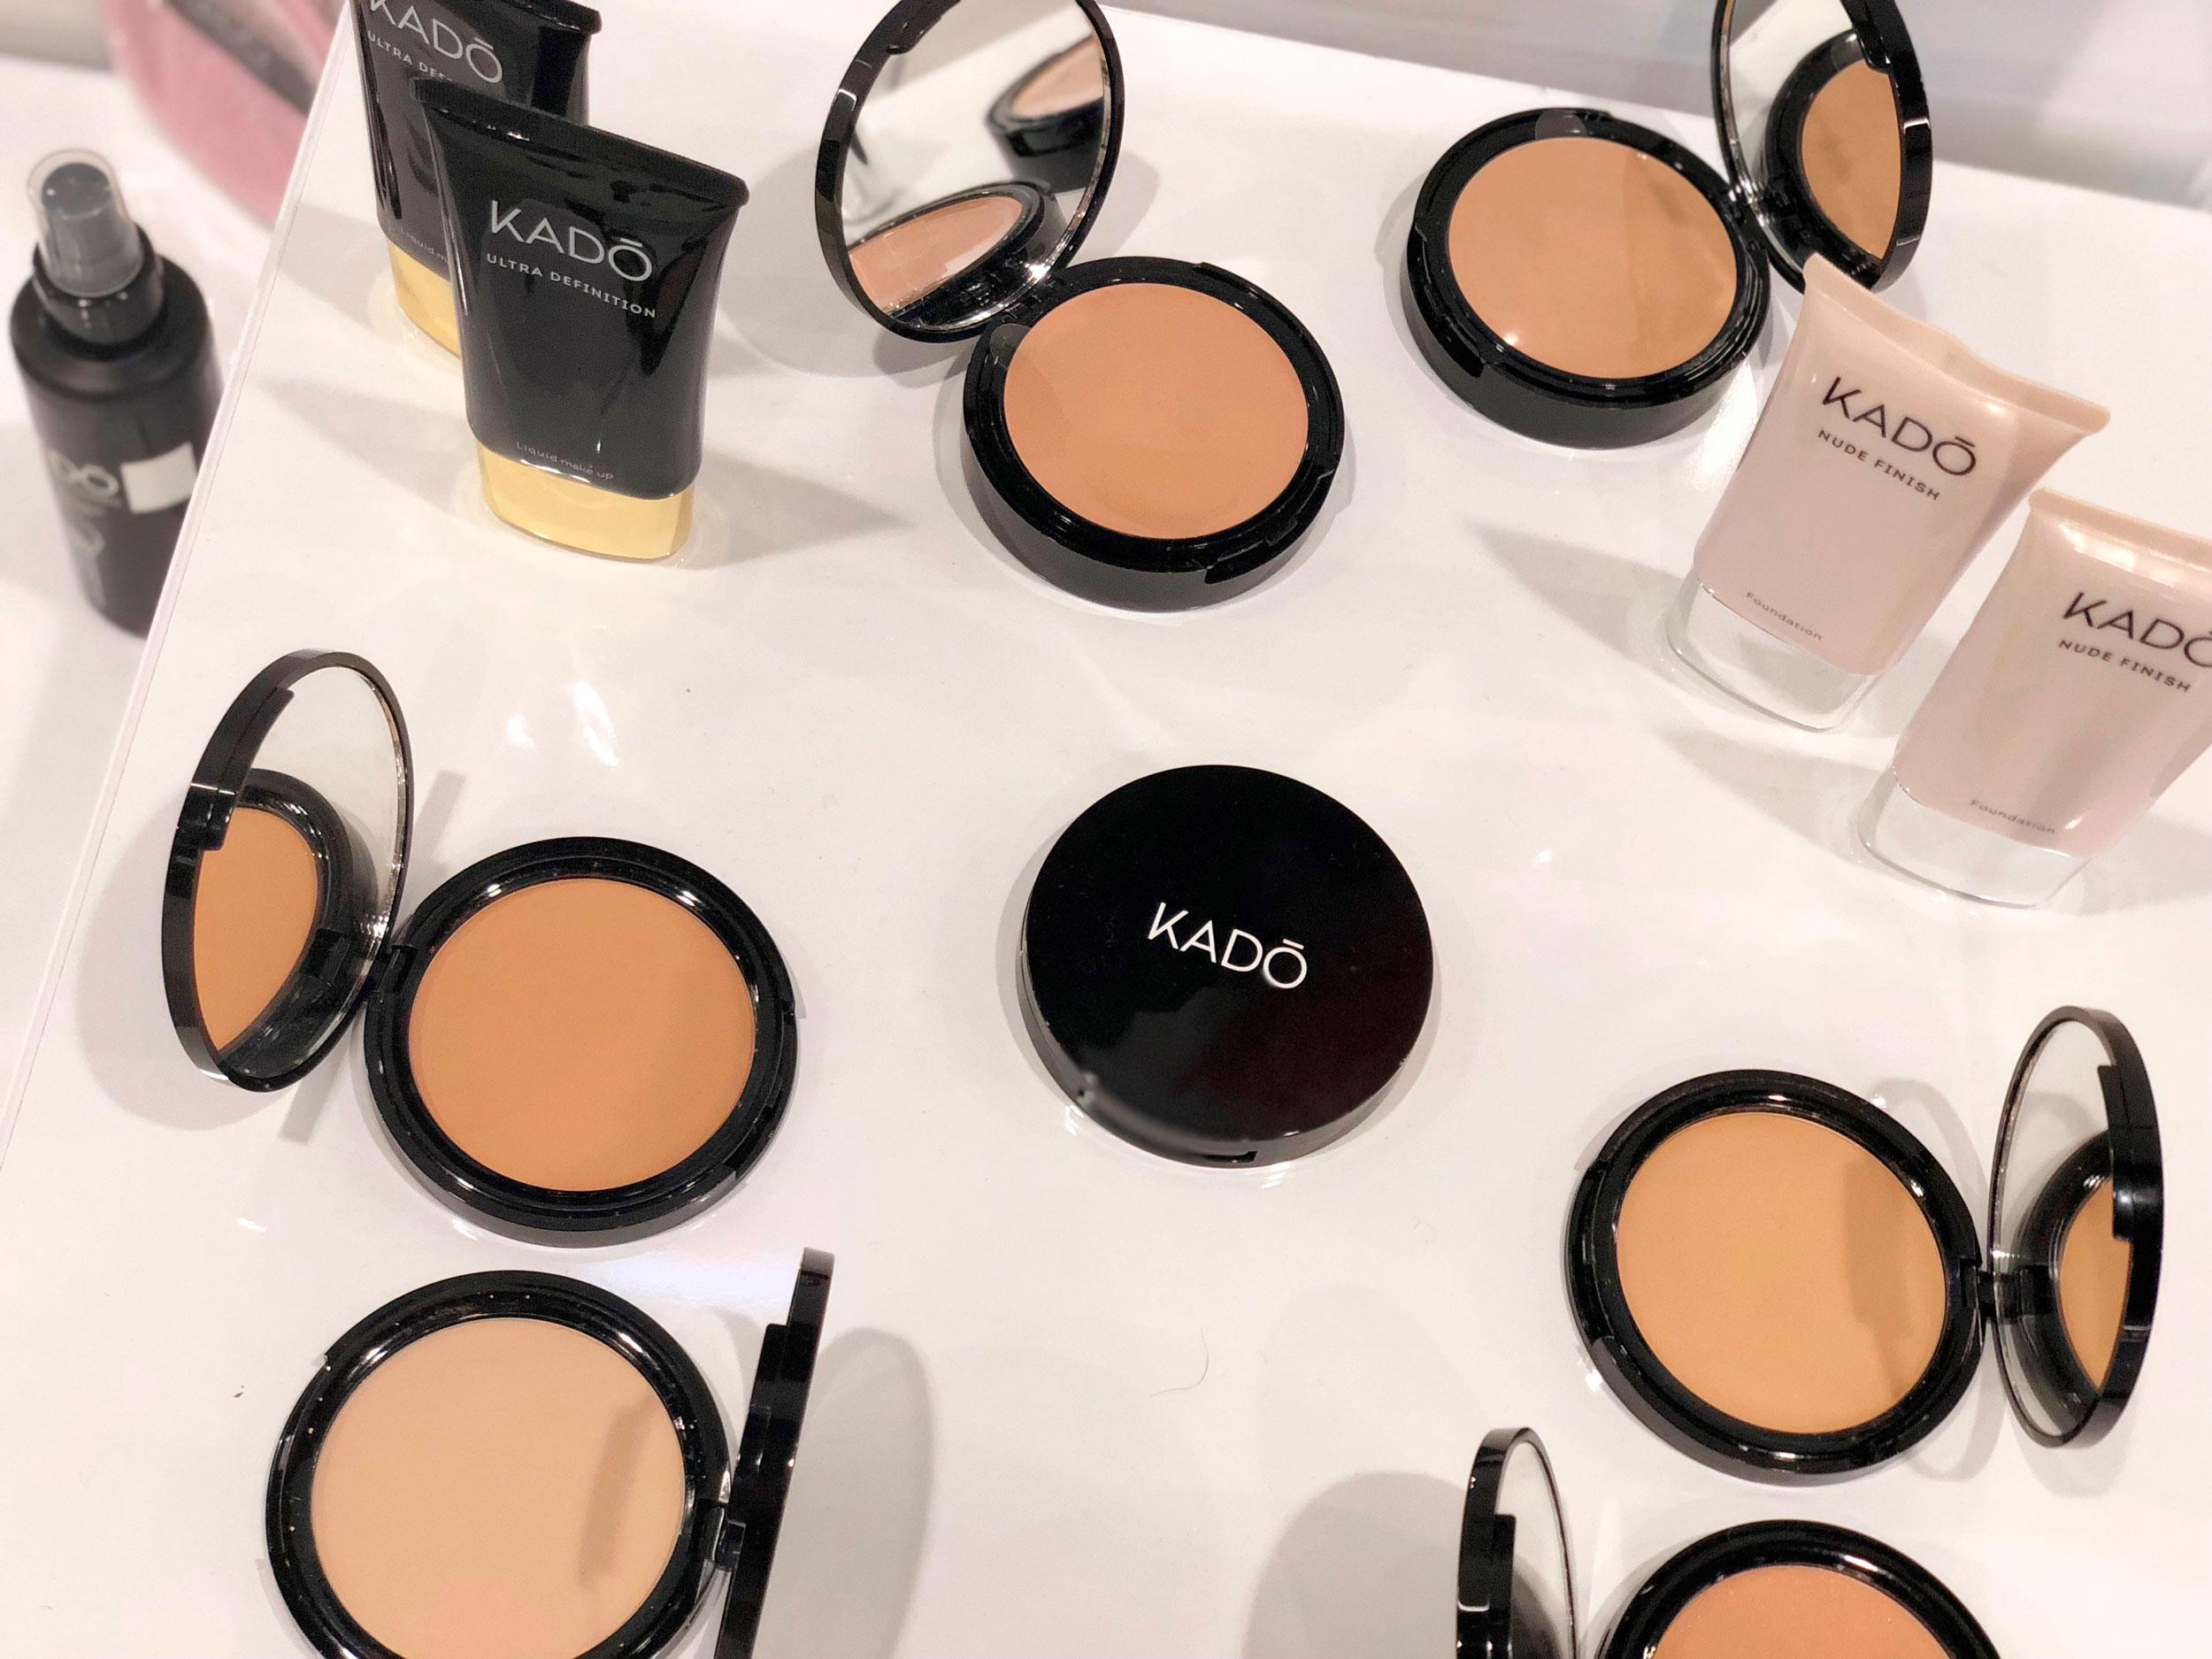 KADŌ bases maquillaje